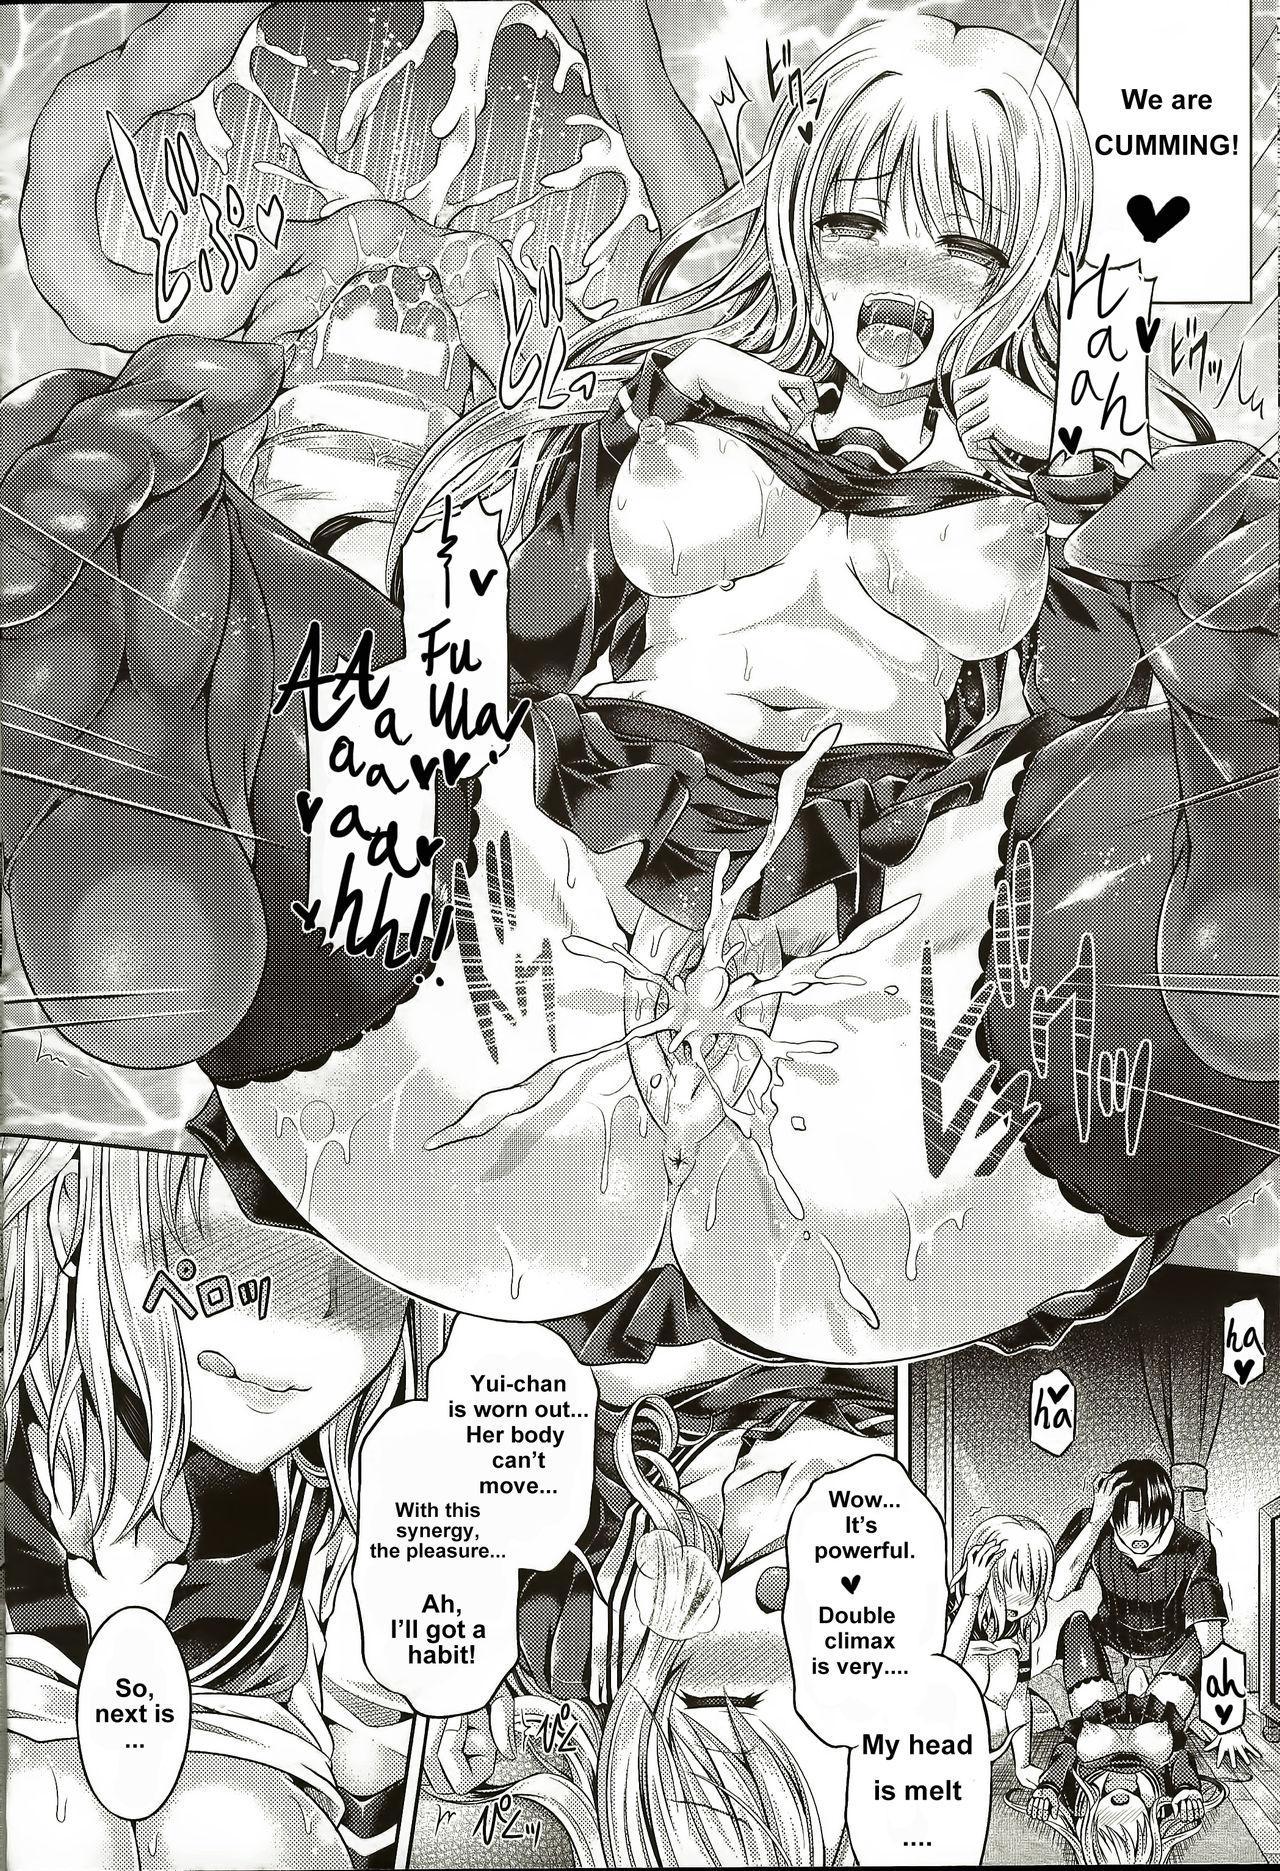 INSERT LEVEL 5: Danjo Kousaku Ecstasy 7